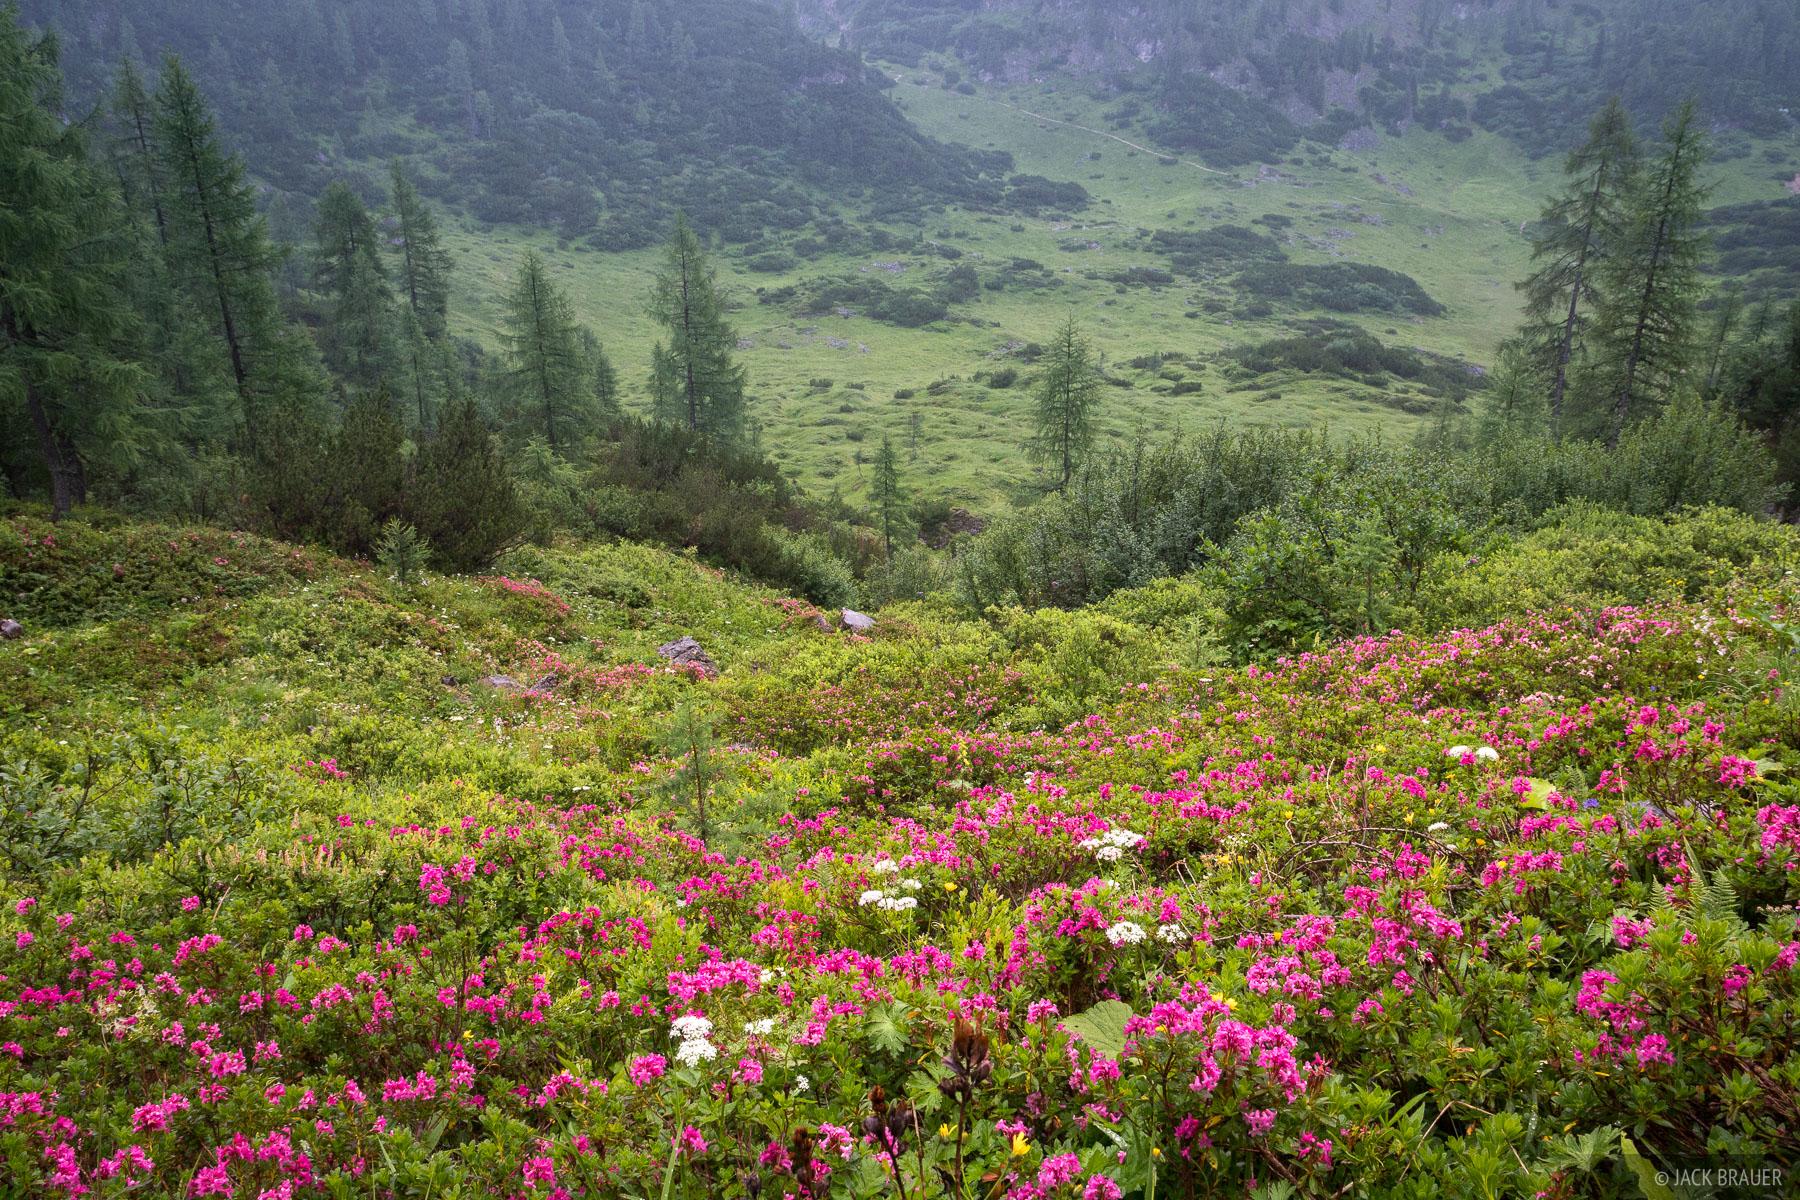 Berchtesgaden, Europe, Germany, wildflowers, alpenrose, photo